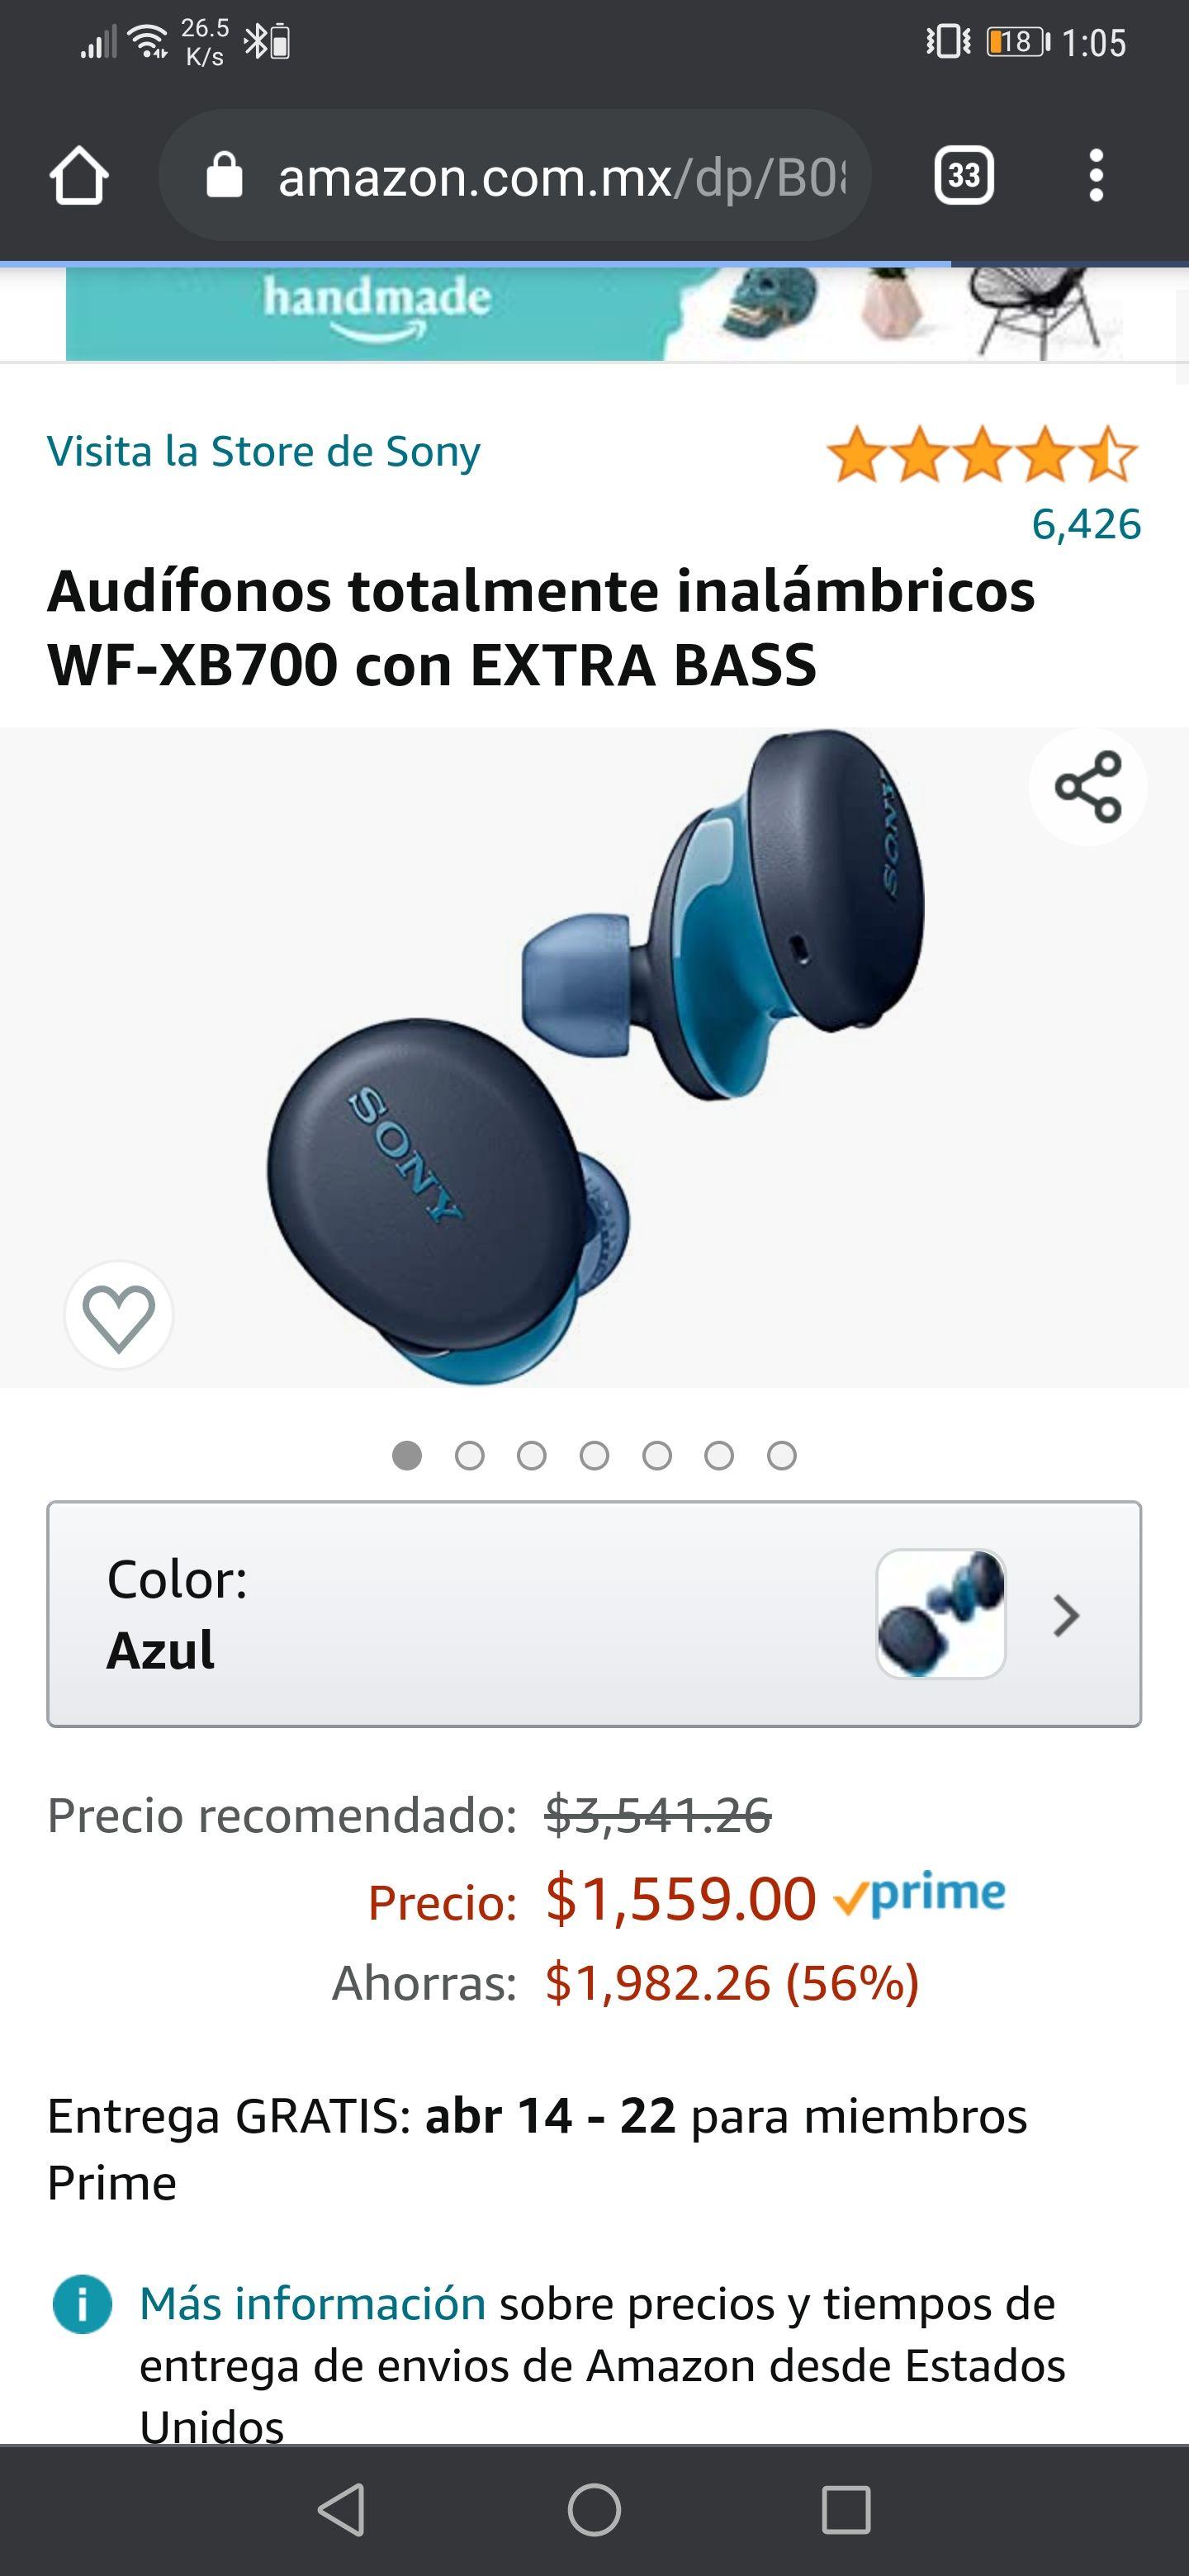 Amazon : Audífonos Sony inalámbricos WF-XB700 con EXTRA BASS de $2,429 a $1,547 mejor precio histórico Keepa